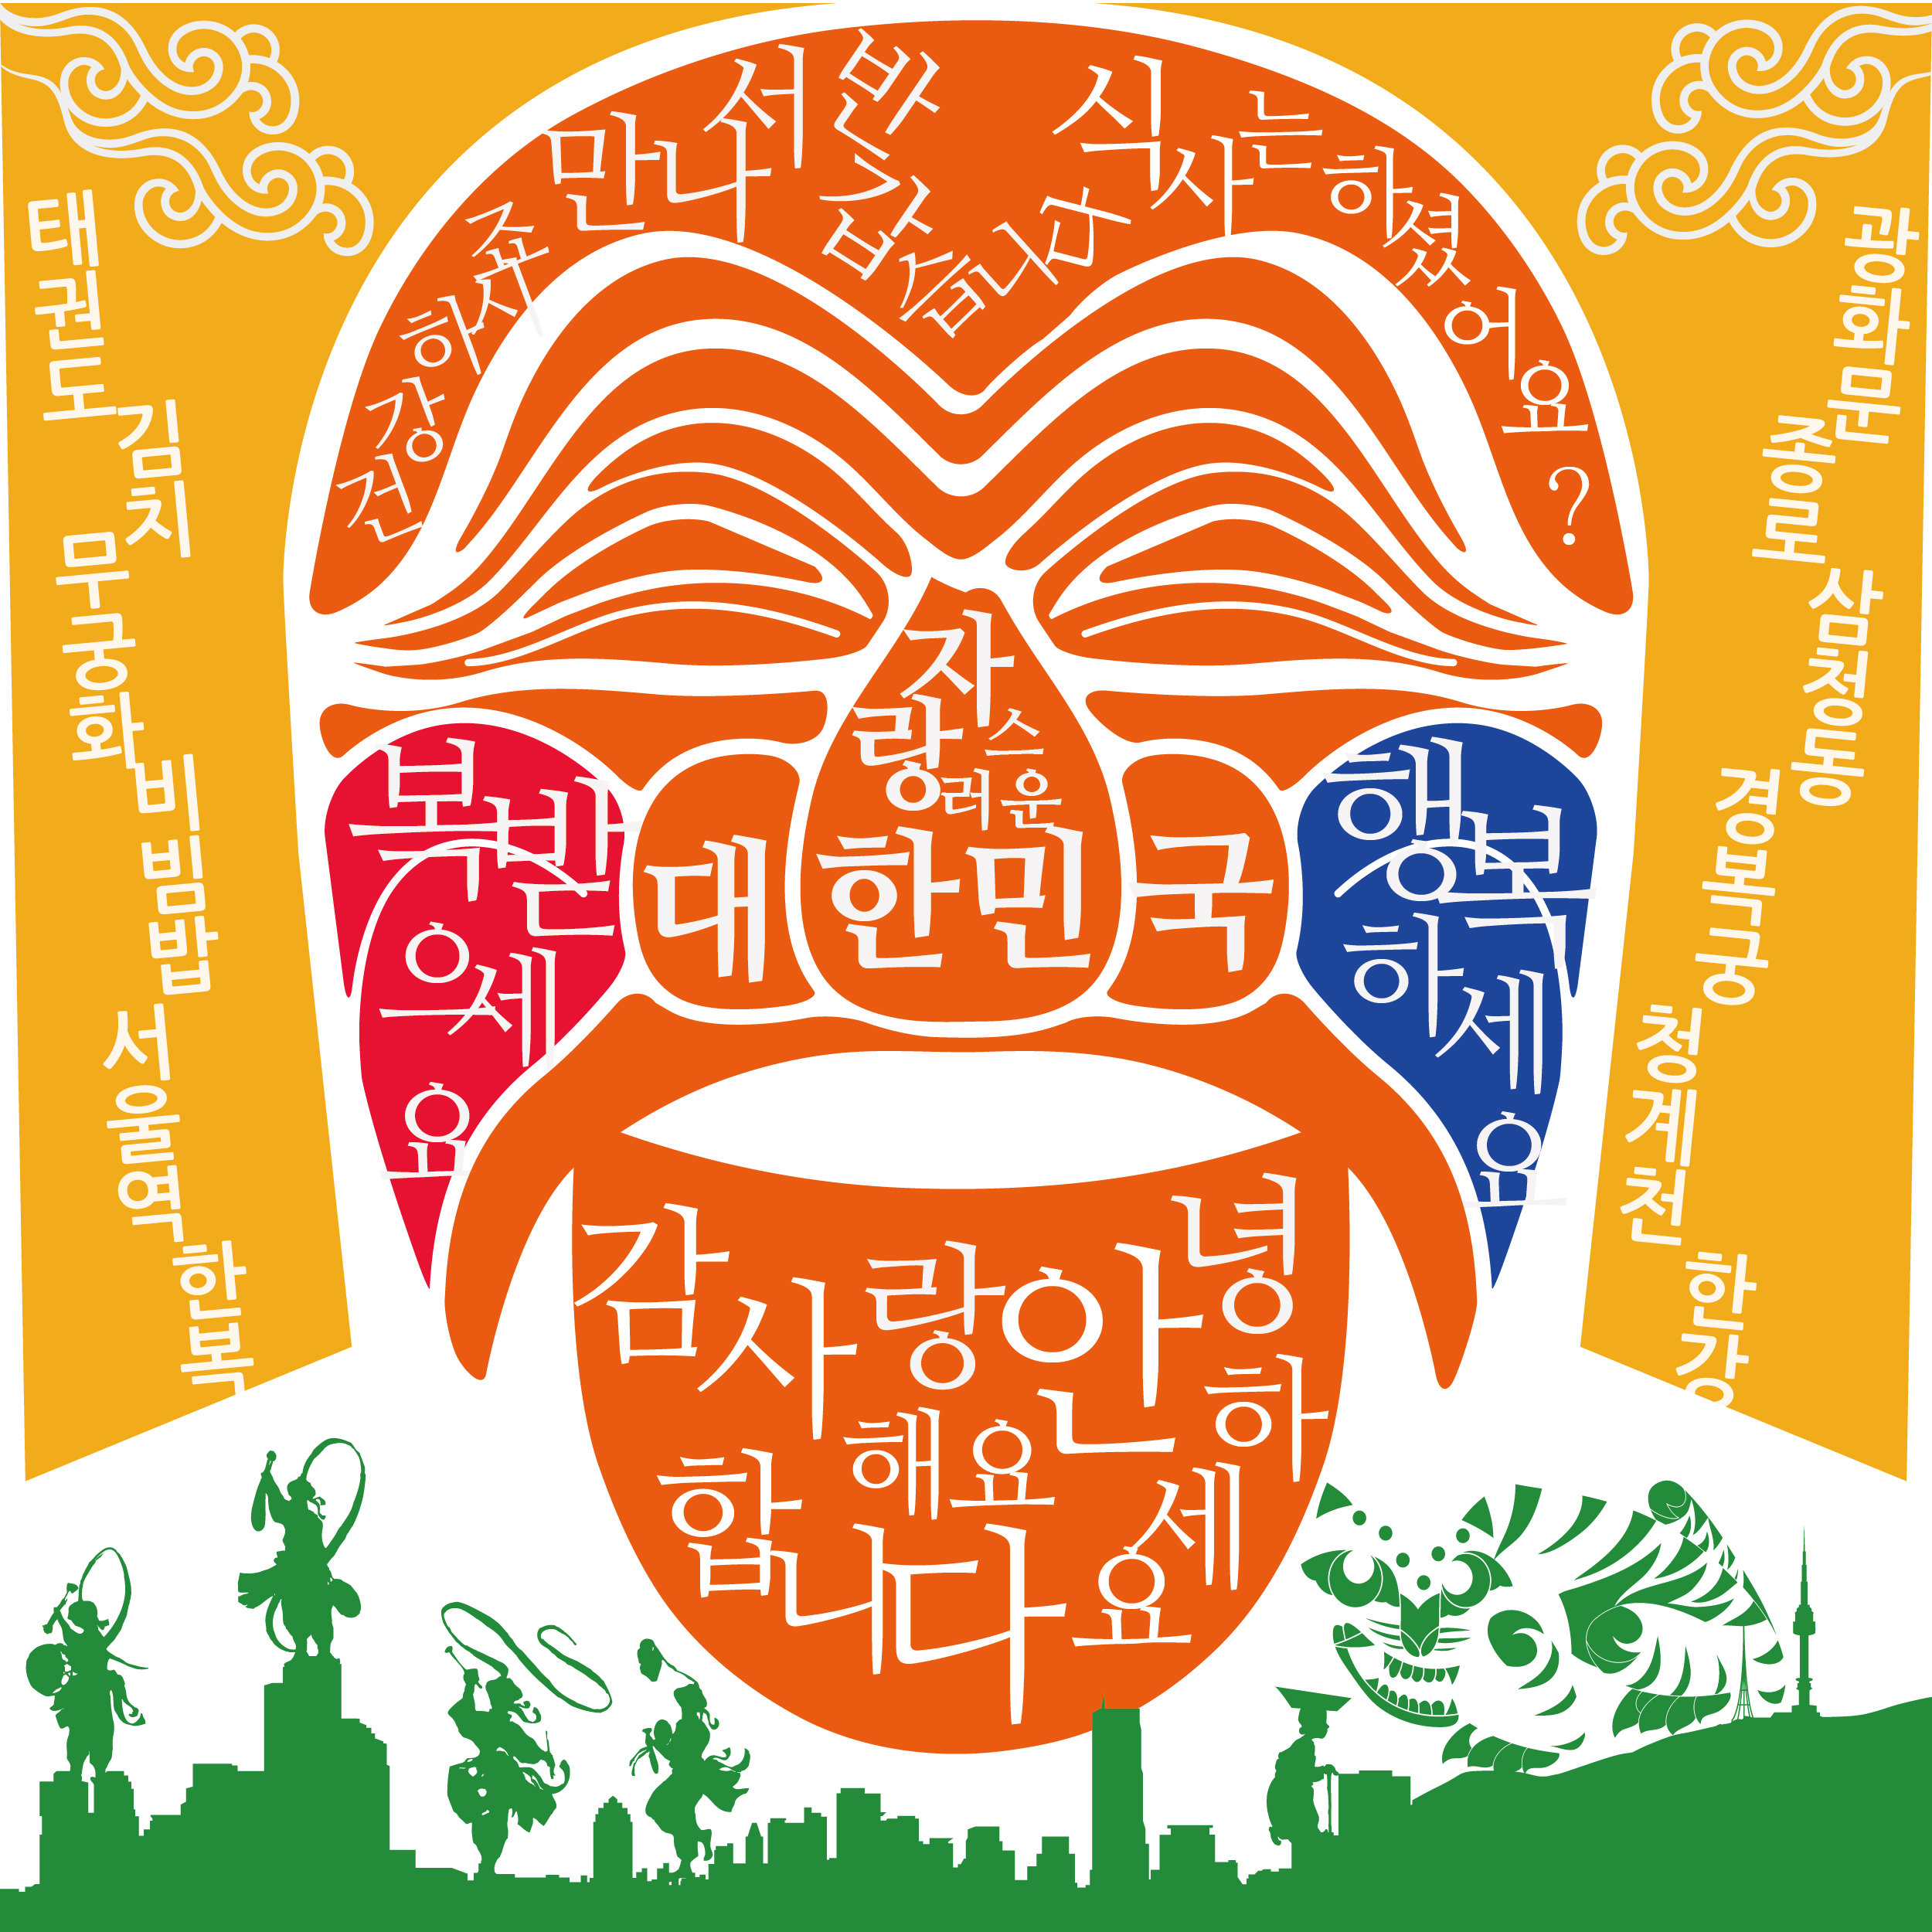 JUNGJURI_KOREA-01-01-01